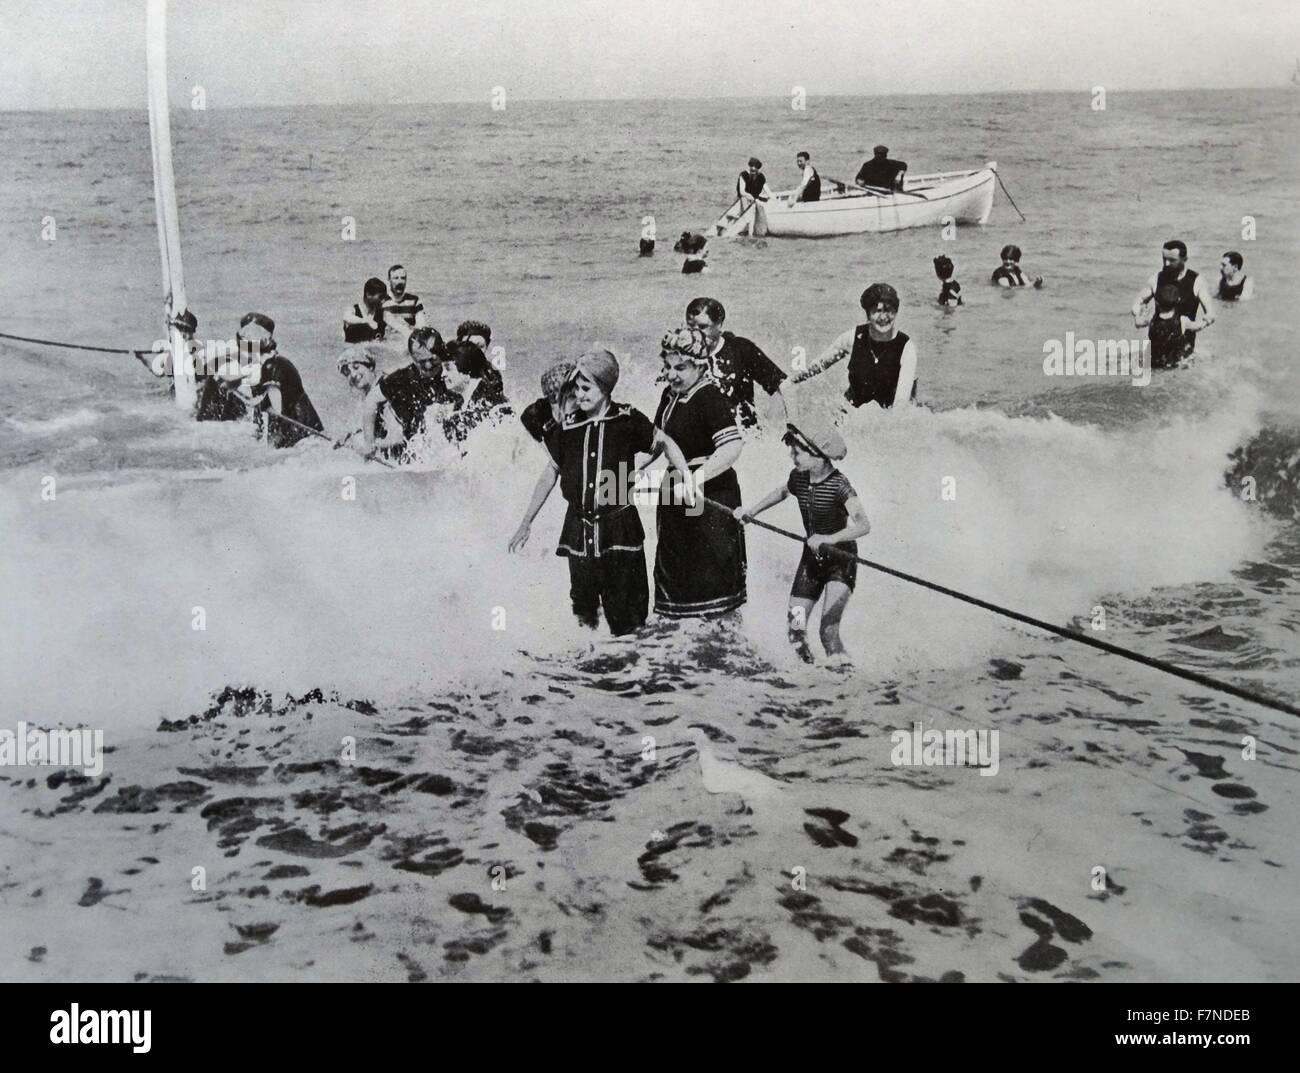 Bathing in Ostend, belgium 1914 - Stock Image